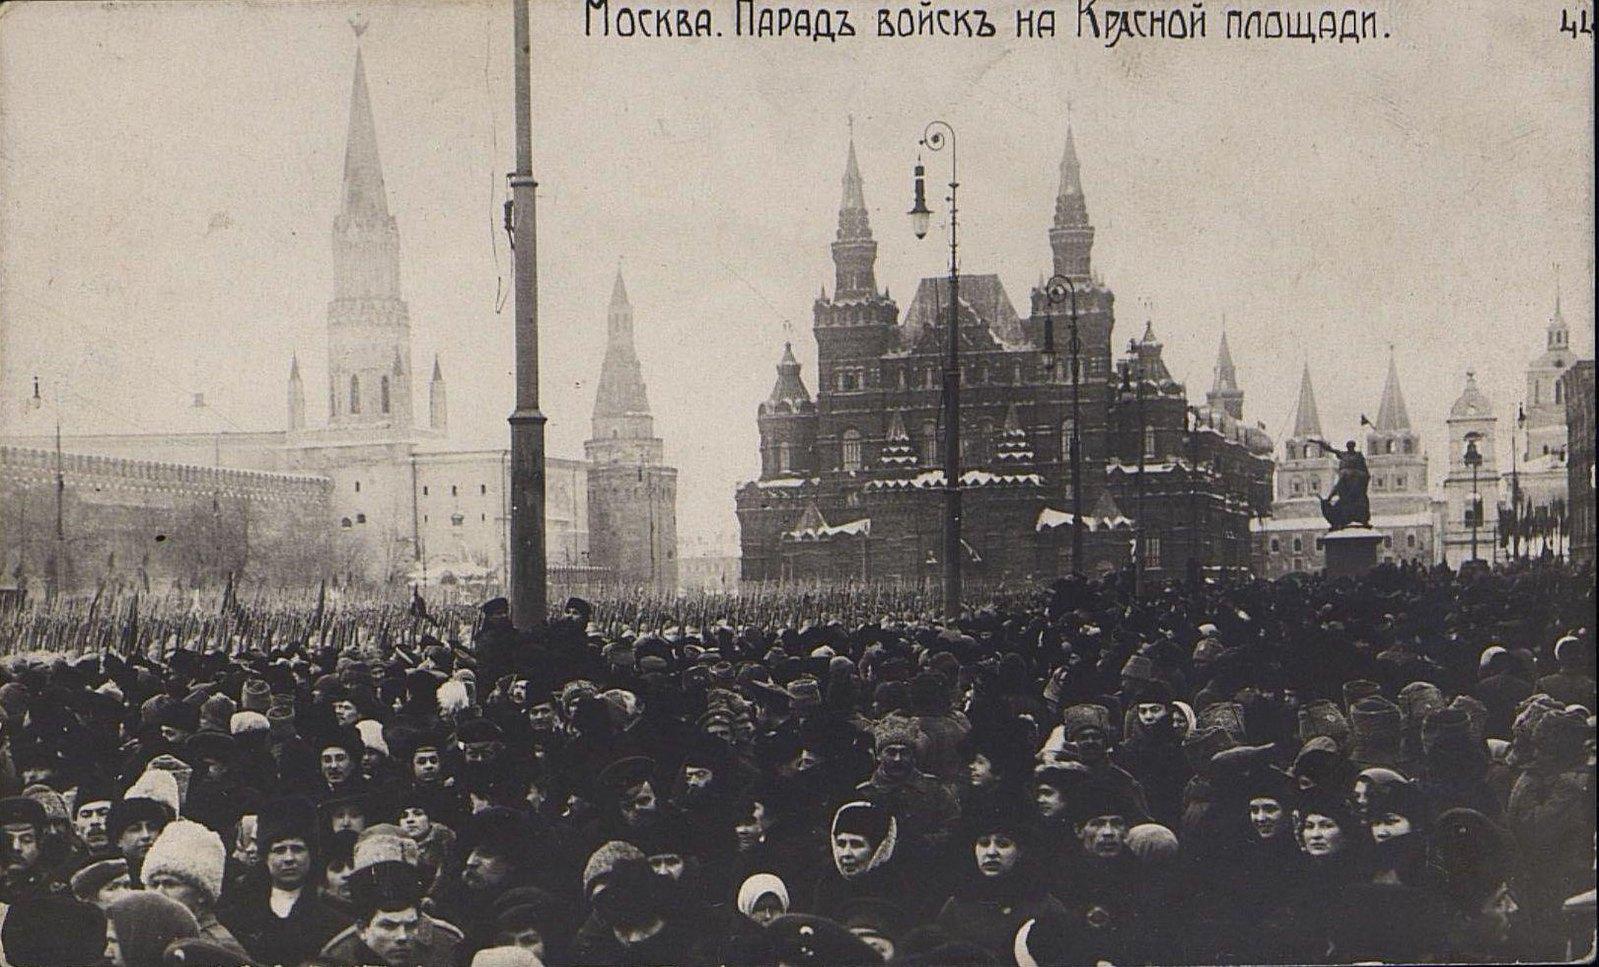 41. Москва. Парад войск на Красной площади